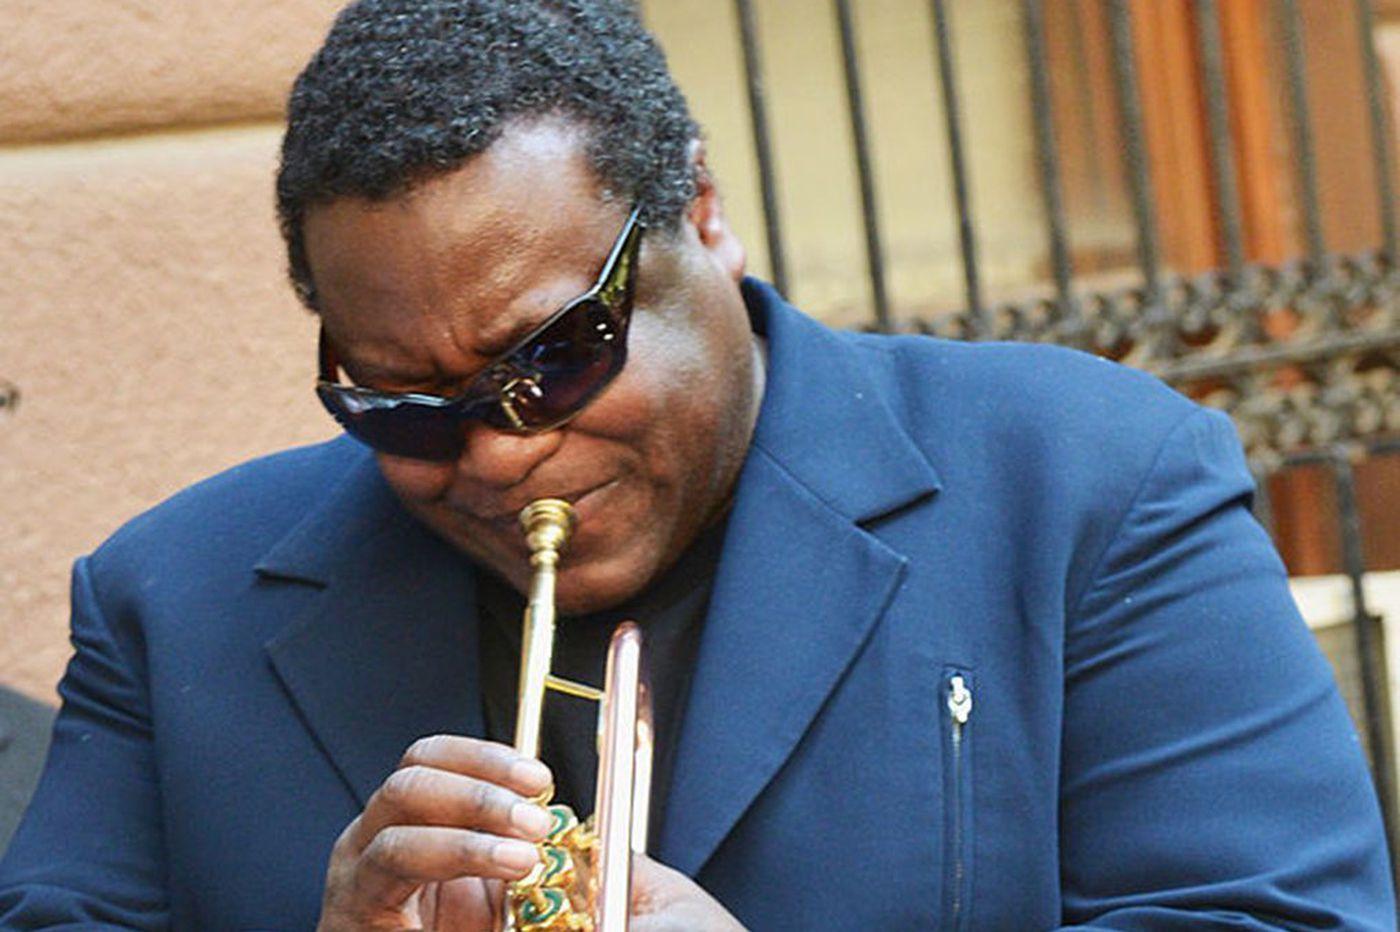 Wallace Roney, Philadelphia-born jazz trumpeter, dies at 59 of coronavirus complications